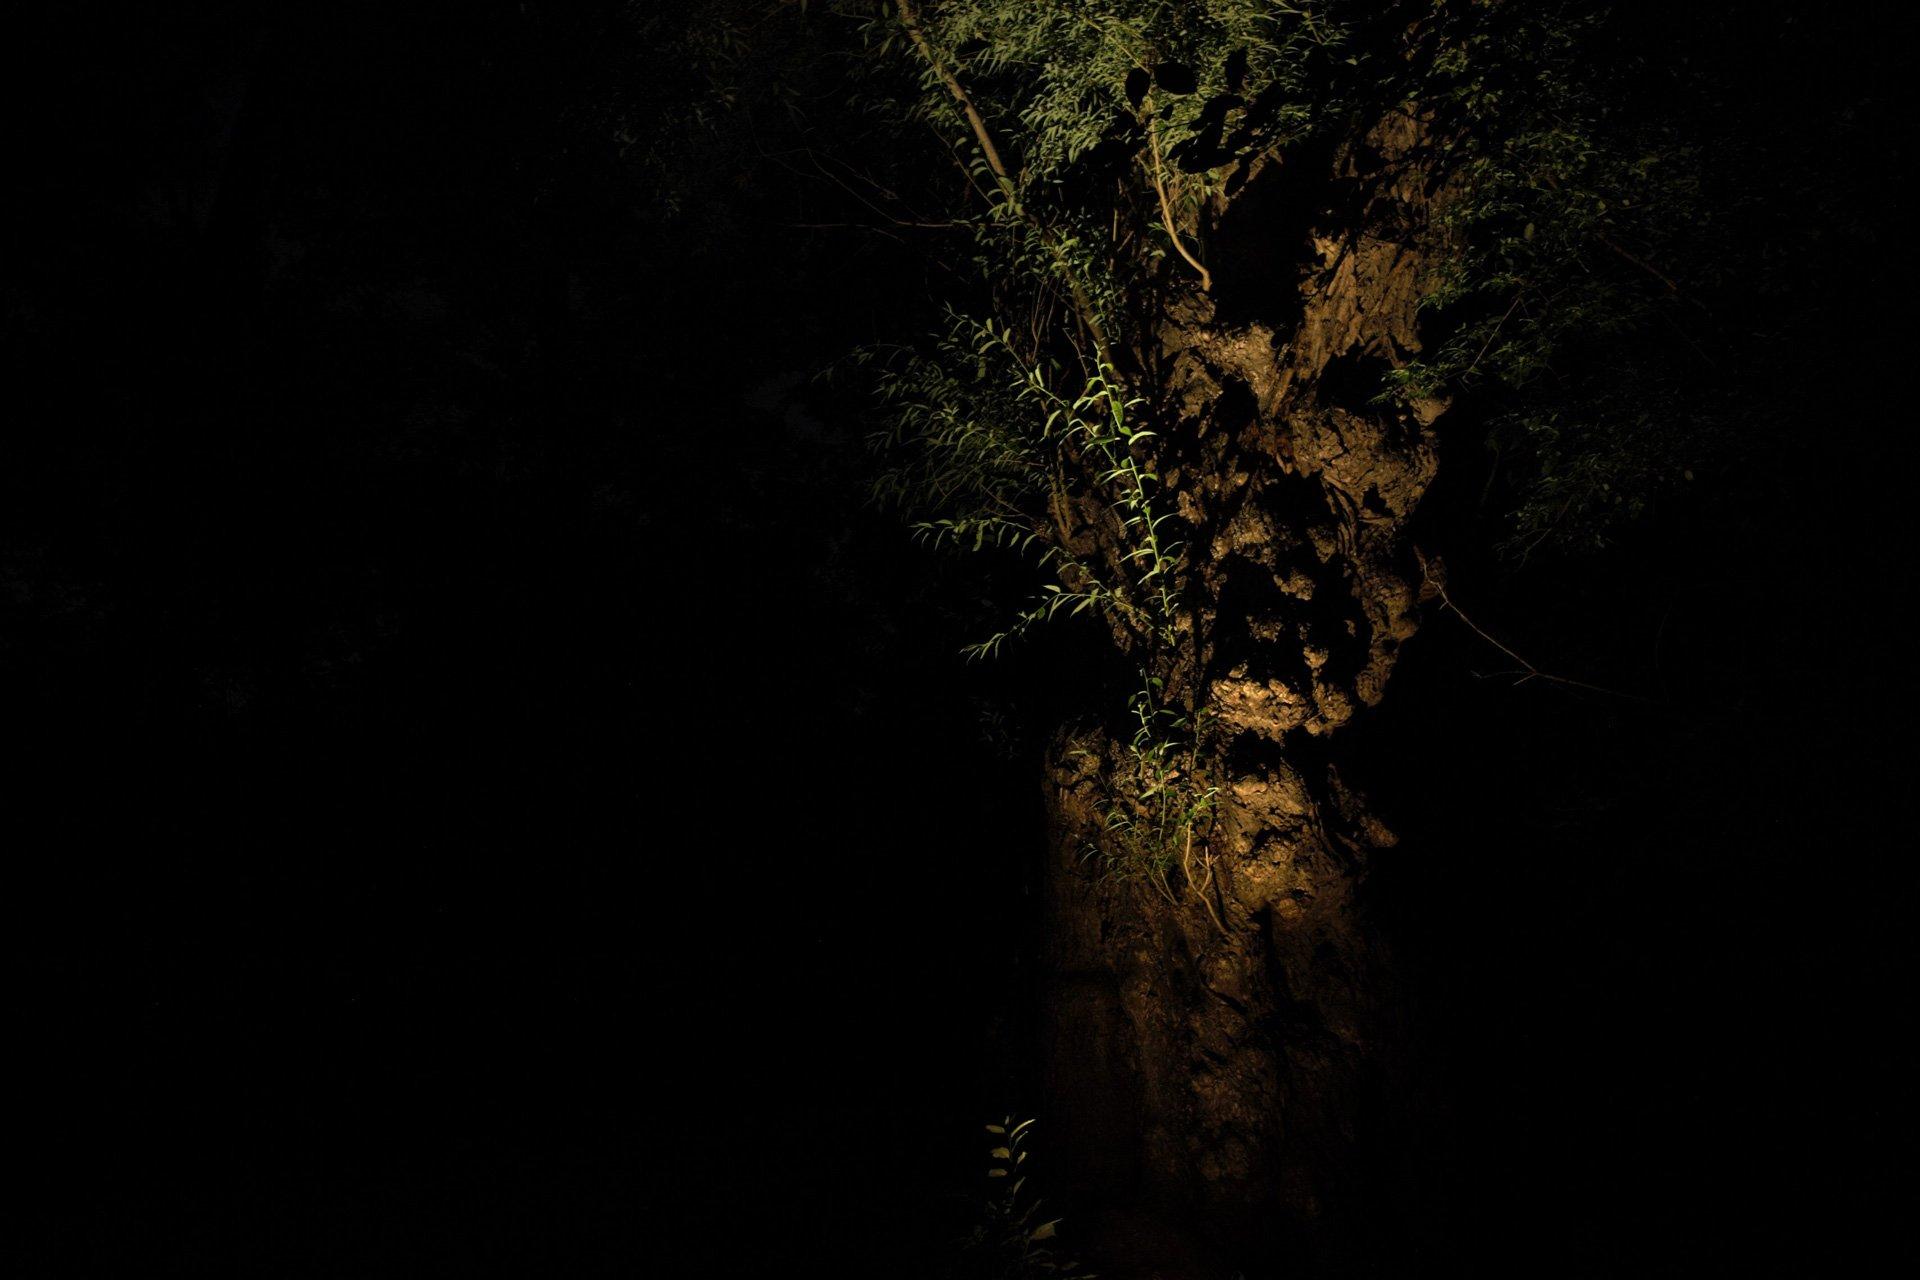 night owl landscape lighting boerner botanical gardens nature tree uplight foliage bark texture